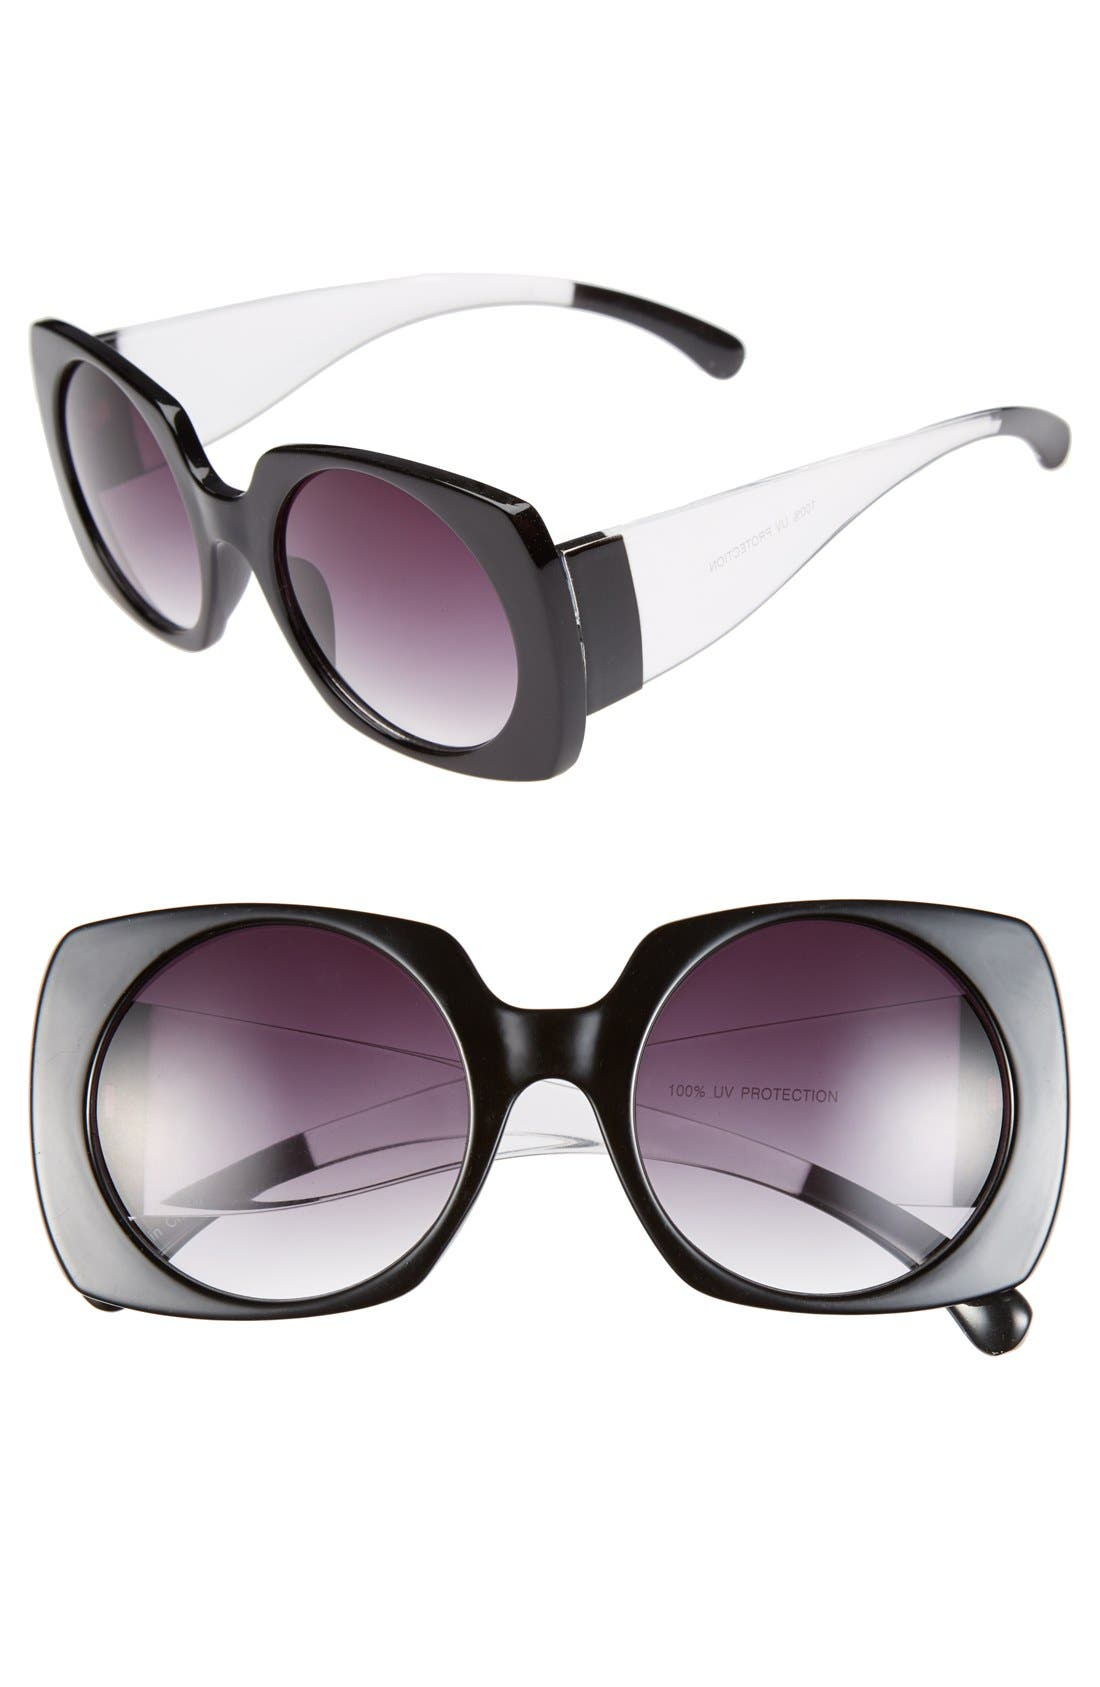 Alternate Image 1 Selected - FE NY 53mm Oversized Square Sunglasses